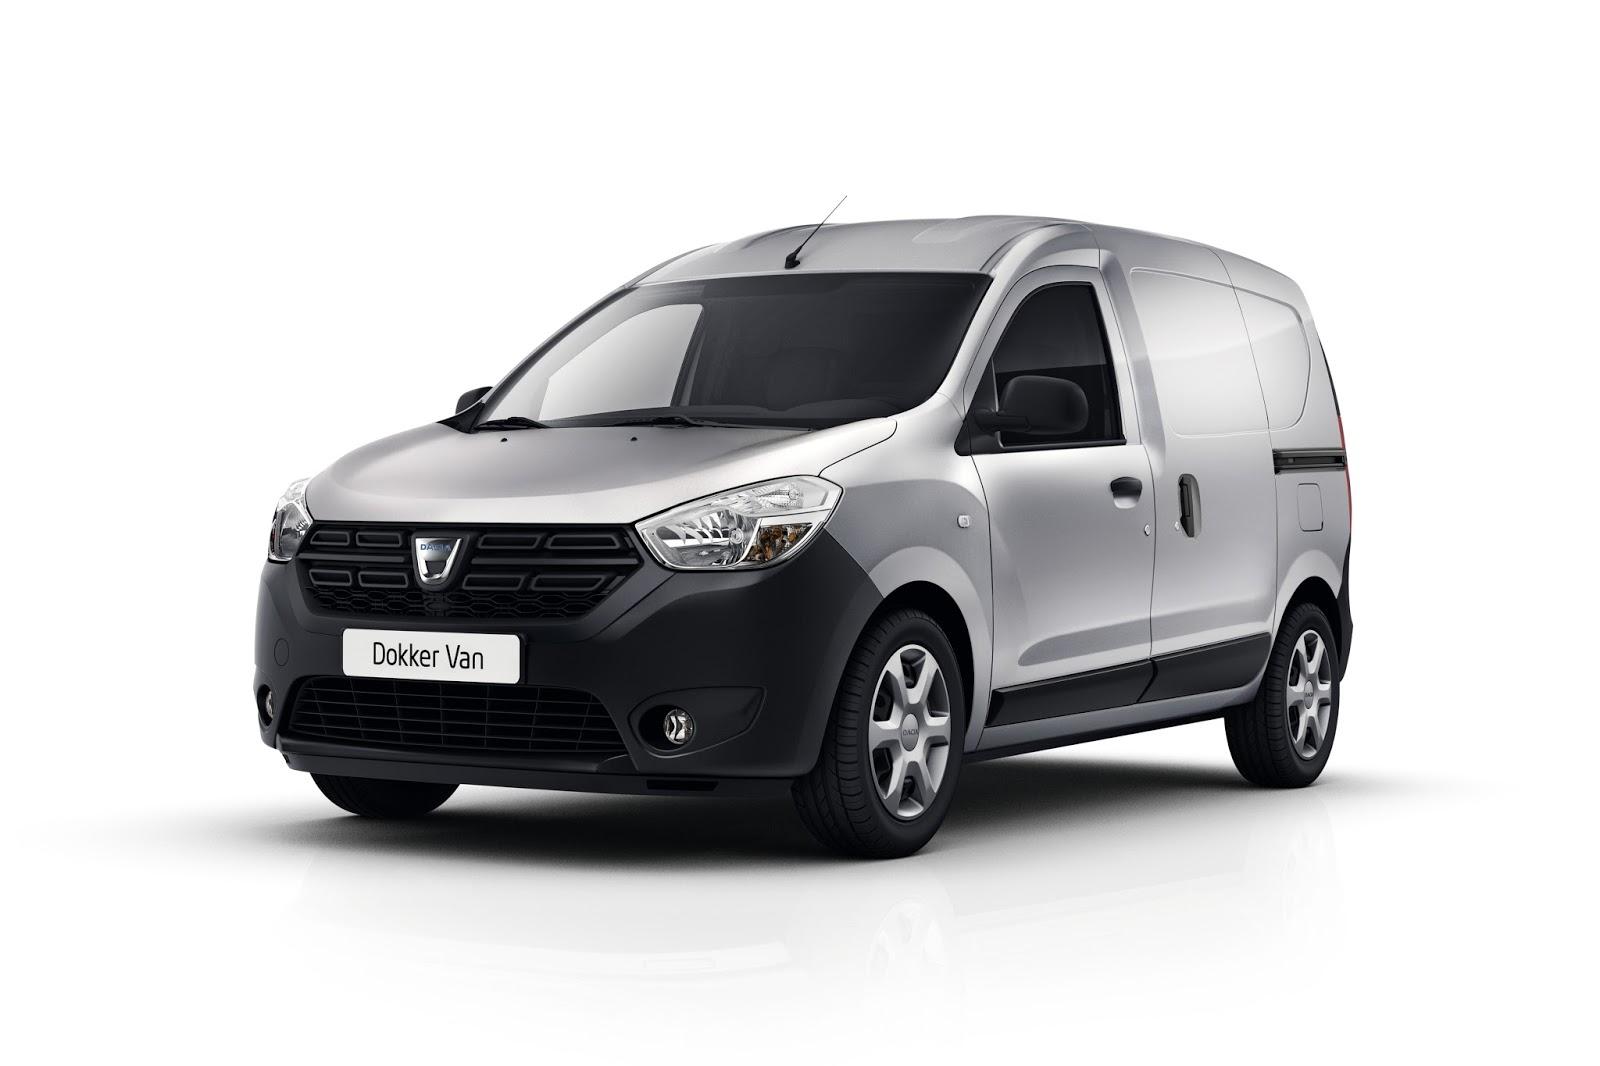 dokker Επίσημη πρώτη για το Dacia Dokker Van